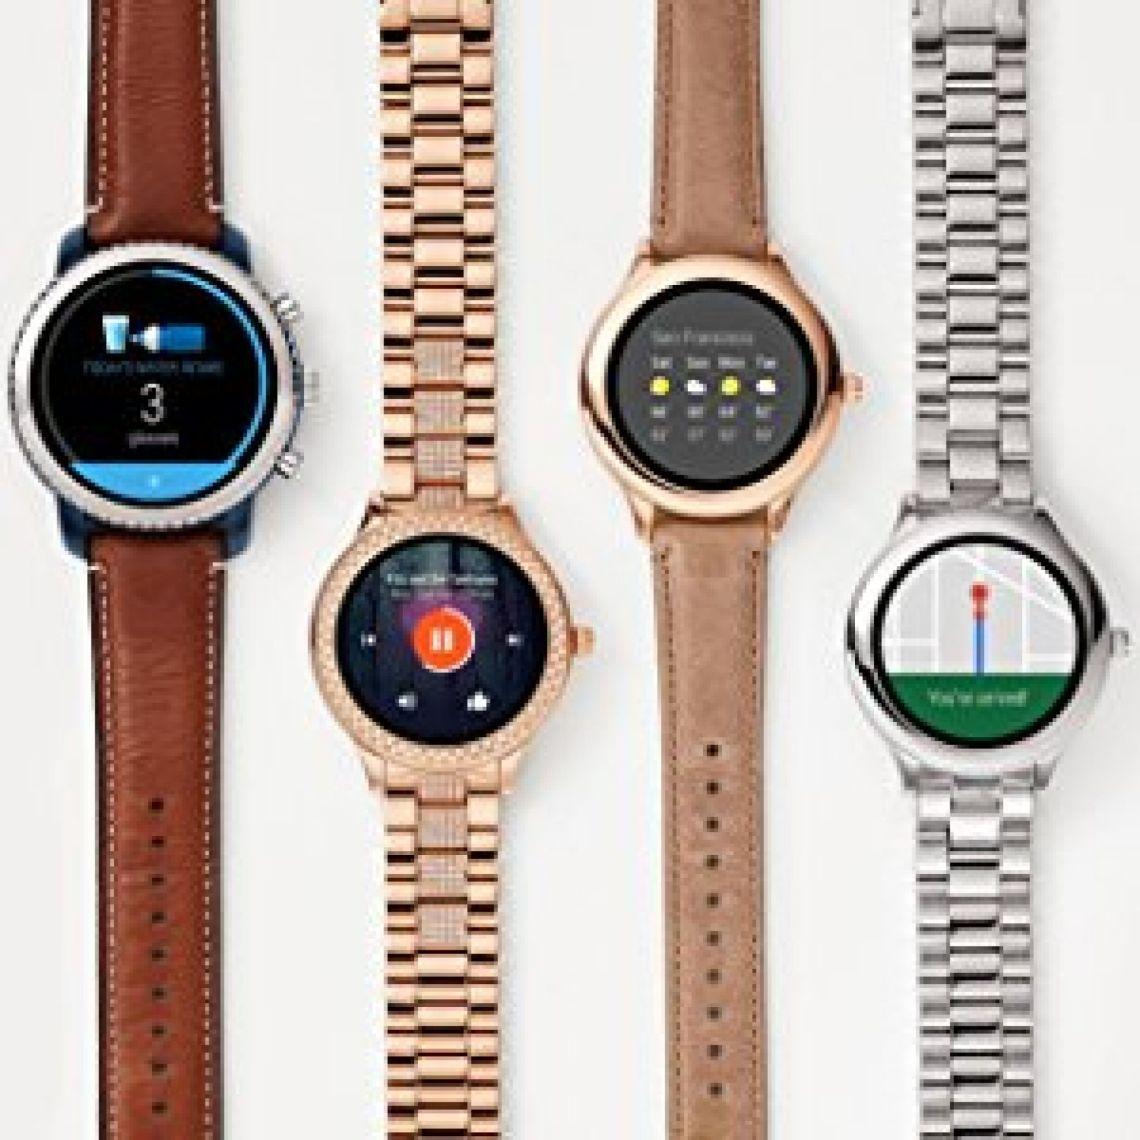 Amazon.com: Fossil Q Men's Gen 3 Explorist Stainless Steel Smartwatch, Color: Silver-Tone (Model: FTW4000): Watches